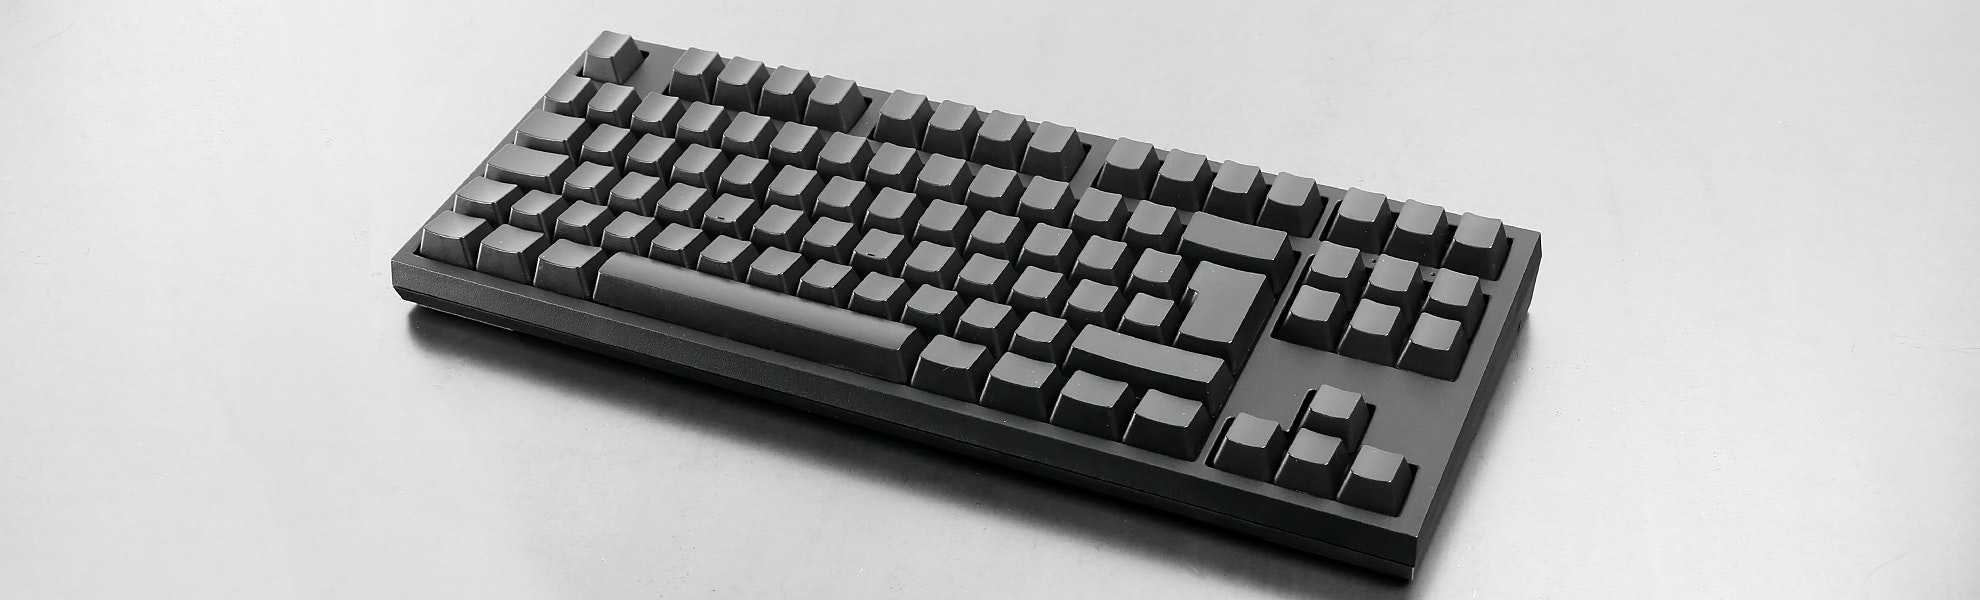 WASD V2 88-Key ISO Keyboard